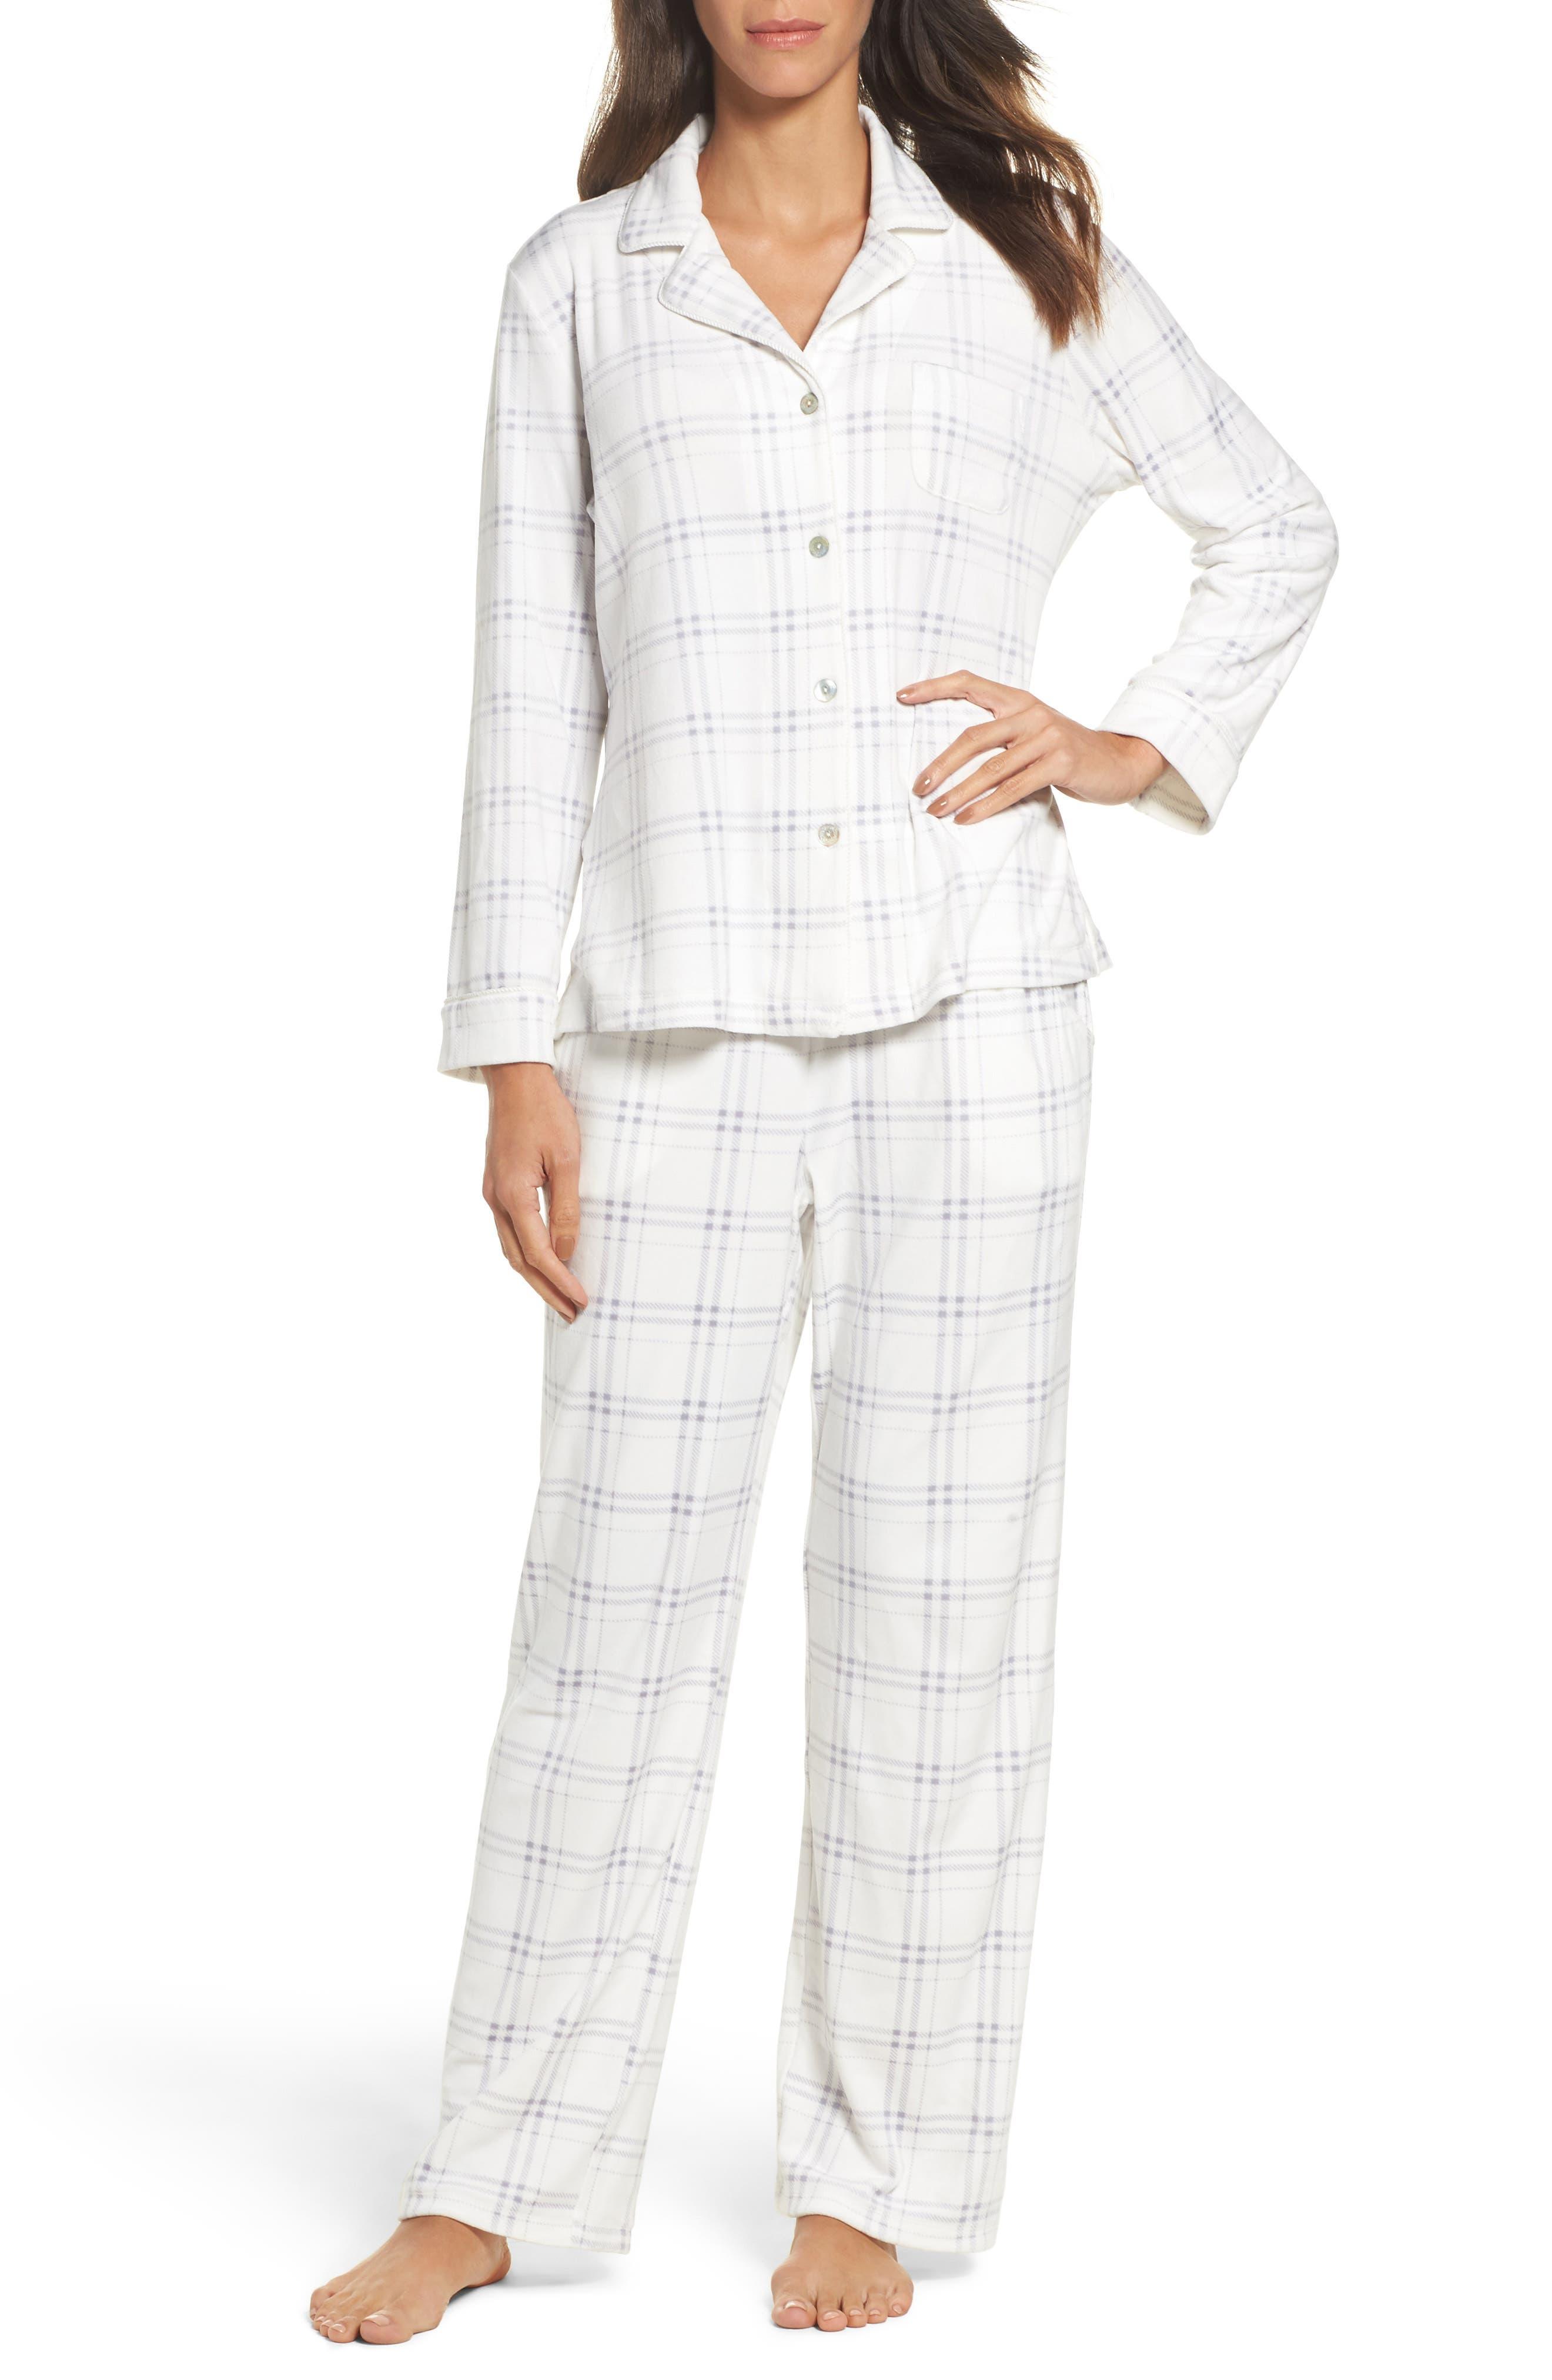 Carole Hochman Fleece Pajamas